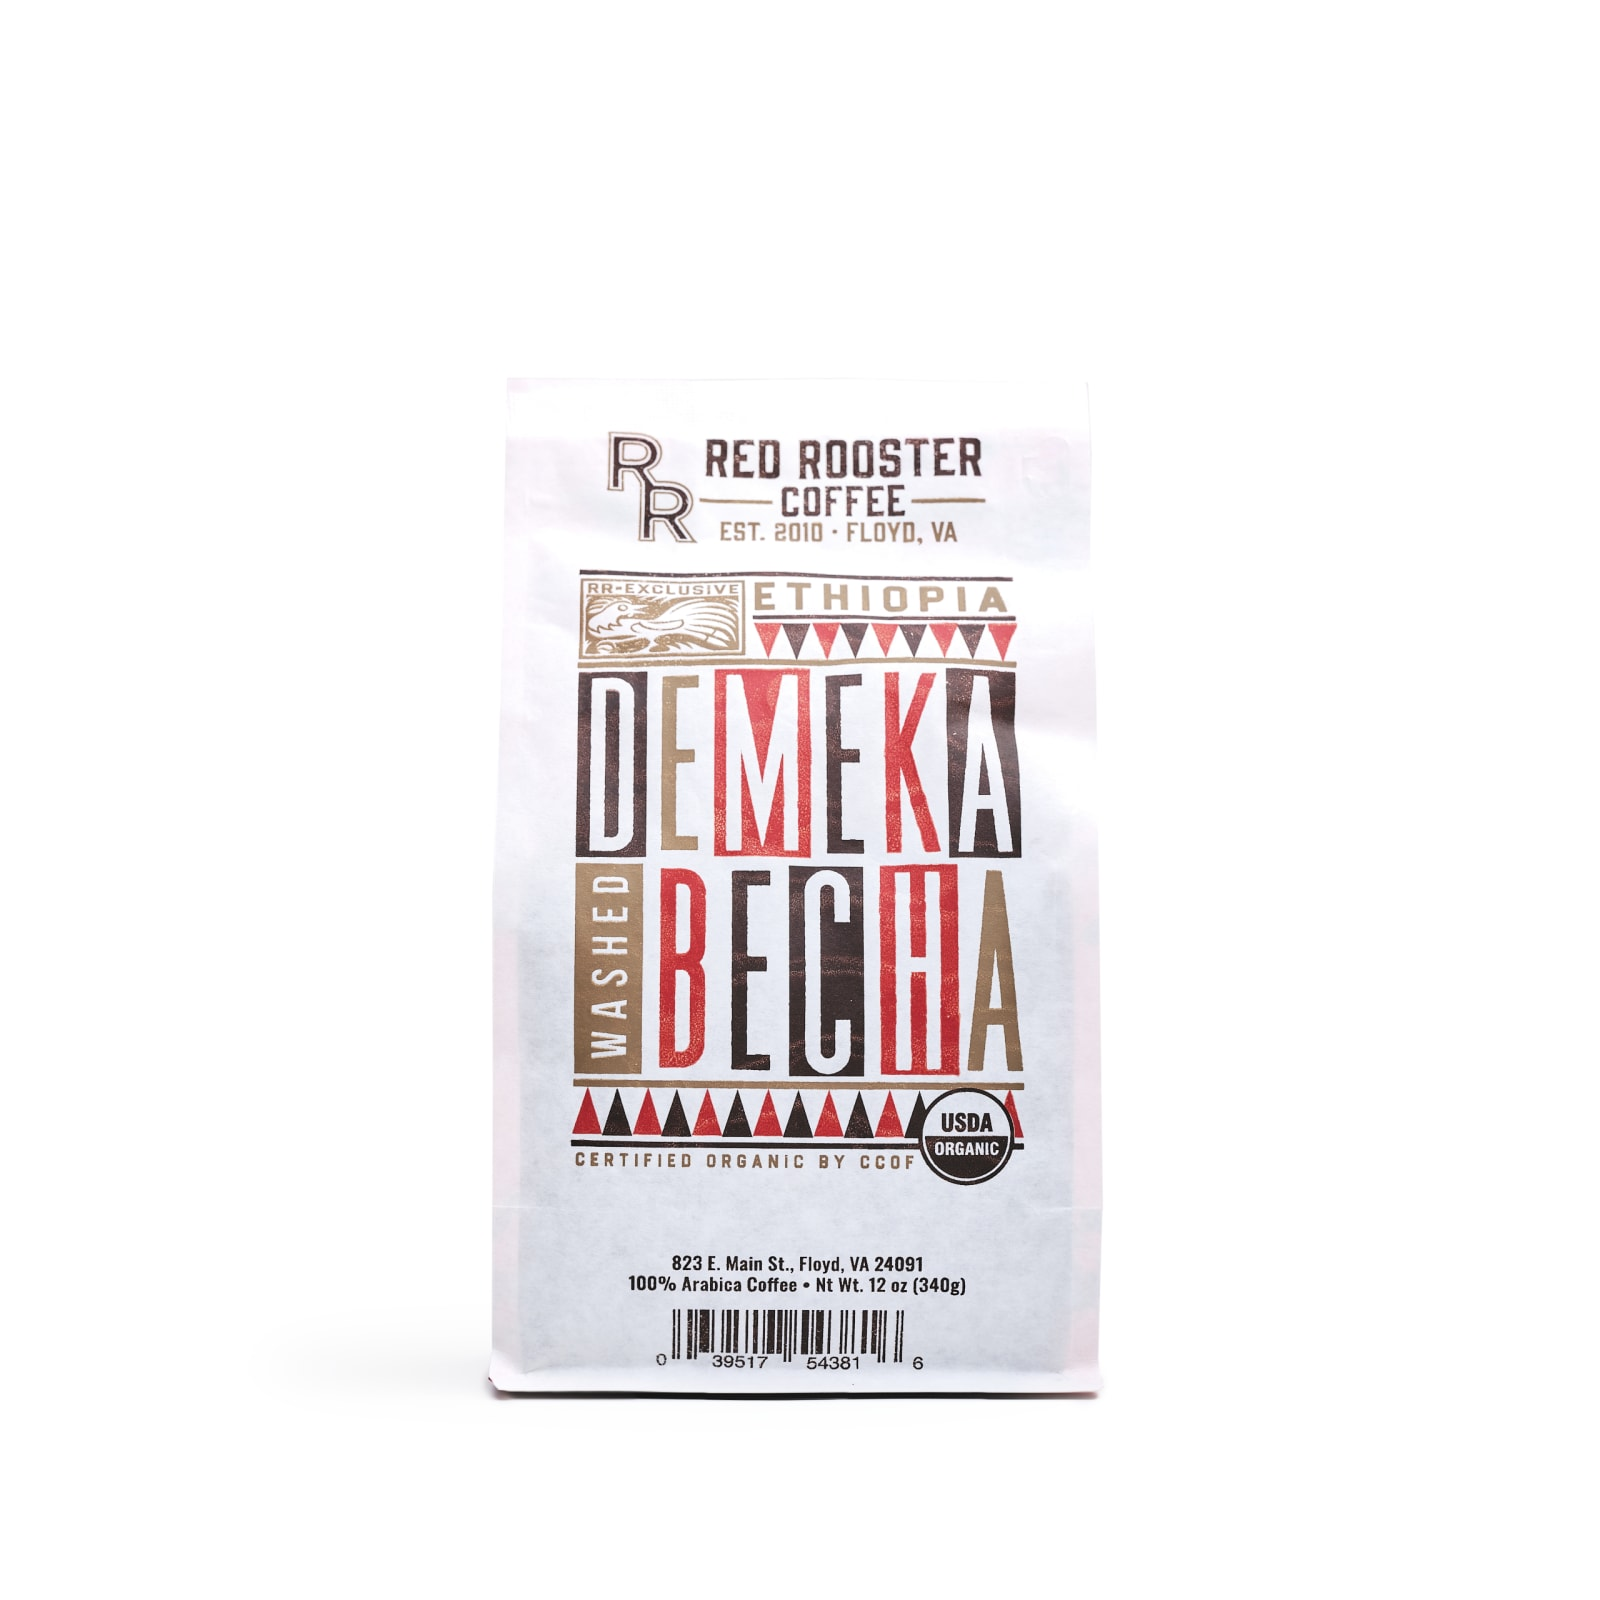 Ethiopia Demeka Becha